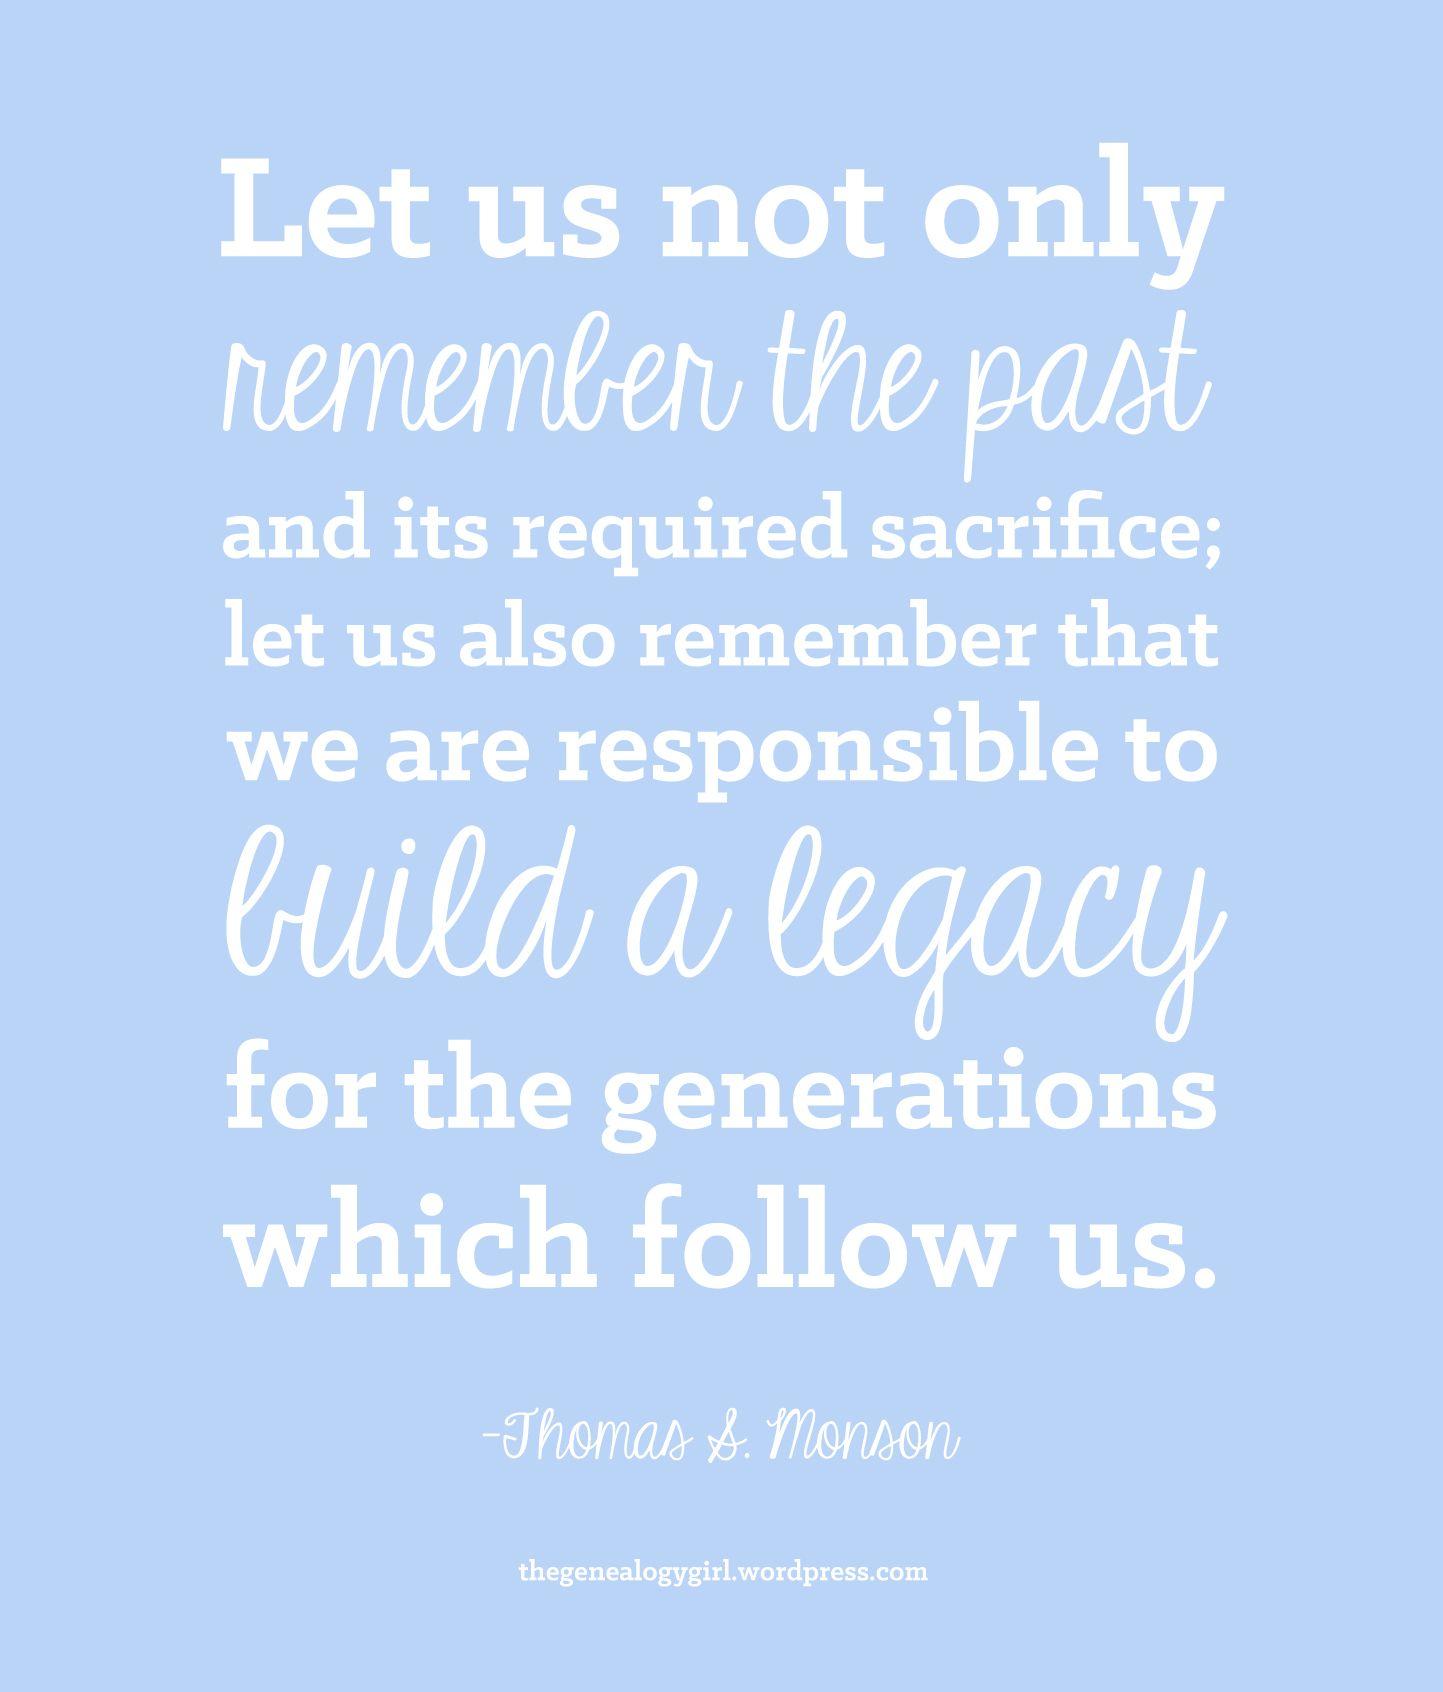 Thomas S. Monson Quote Family history quotes, Thomas s